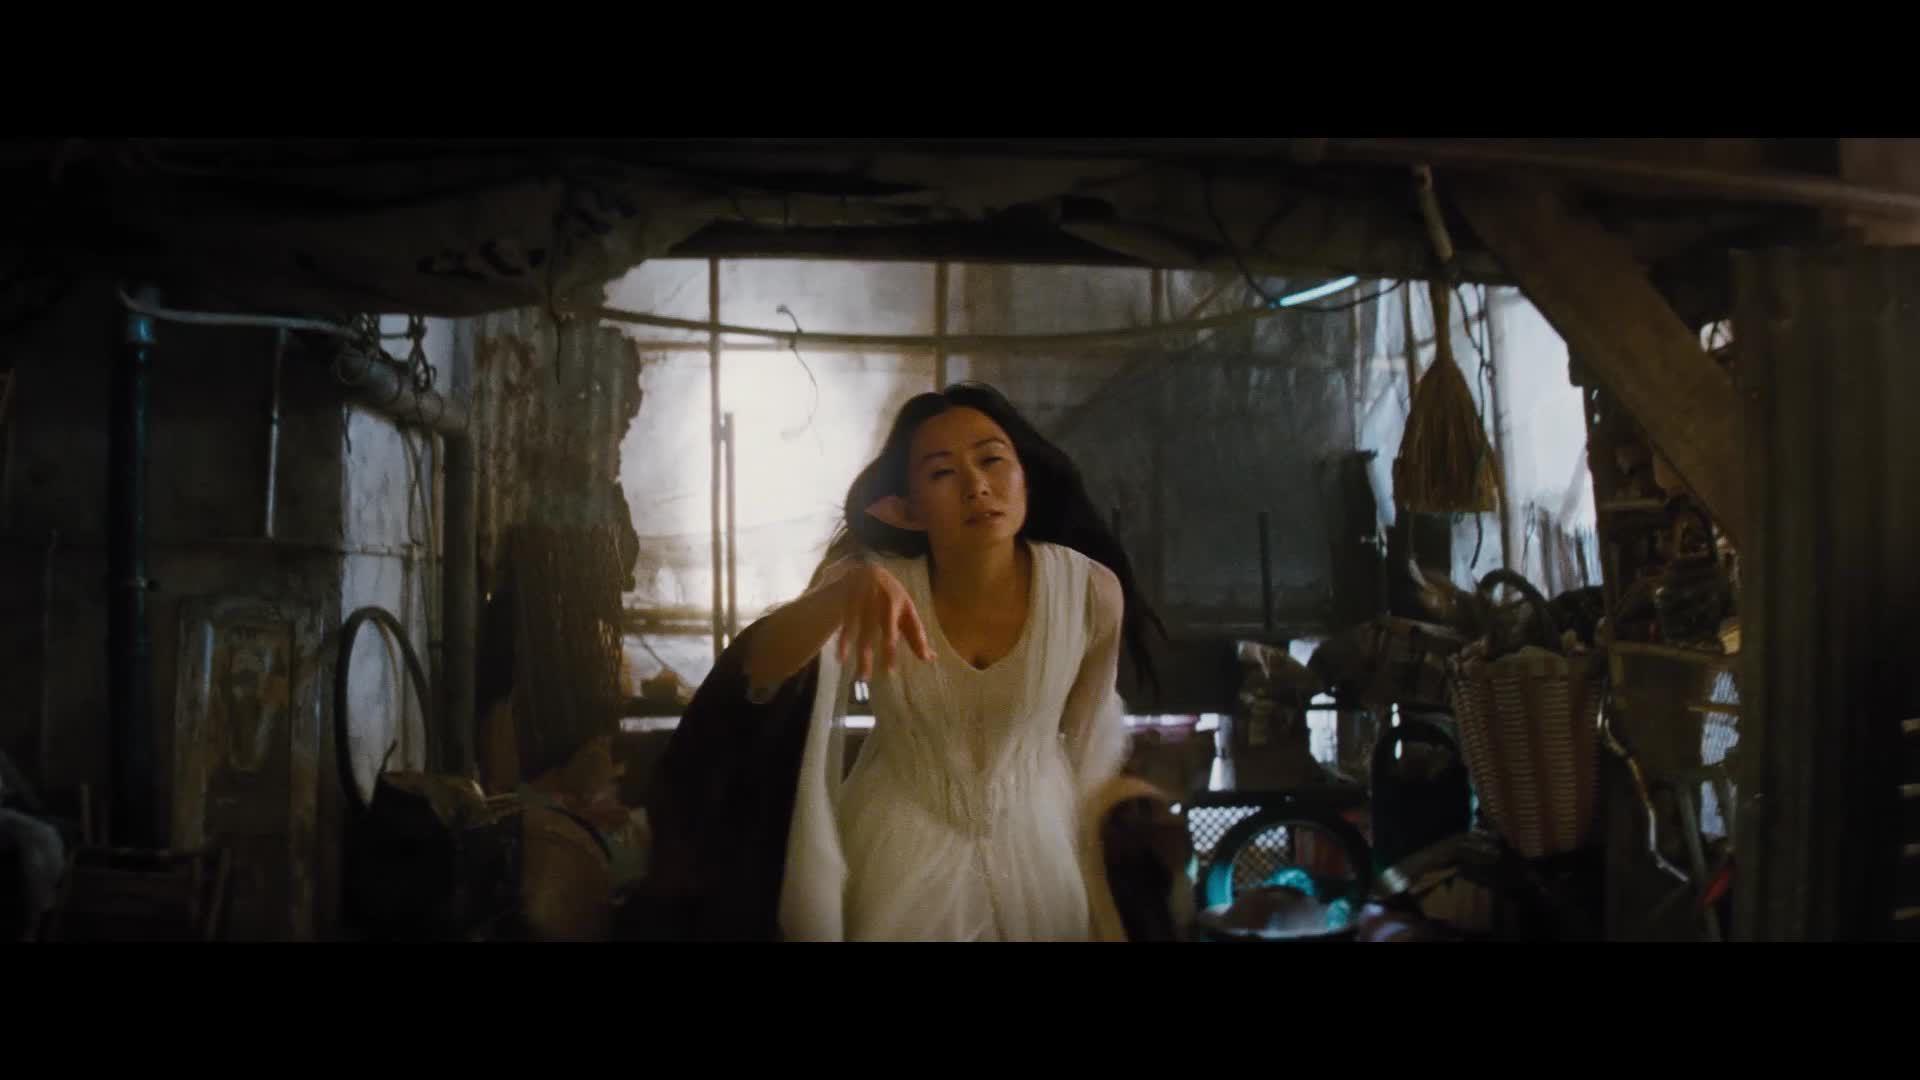 Bom tấn kỳ ảo Artemis Fowl của Disney lấy bối cảnh Việt Nam